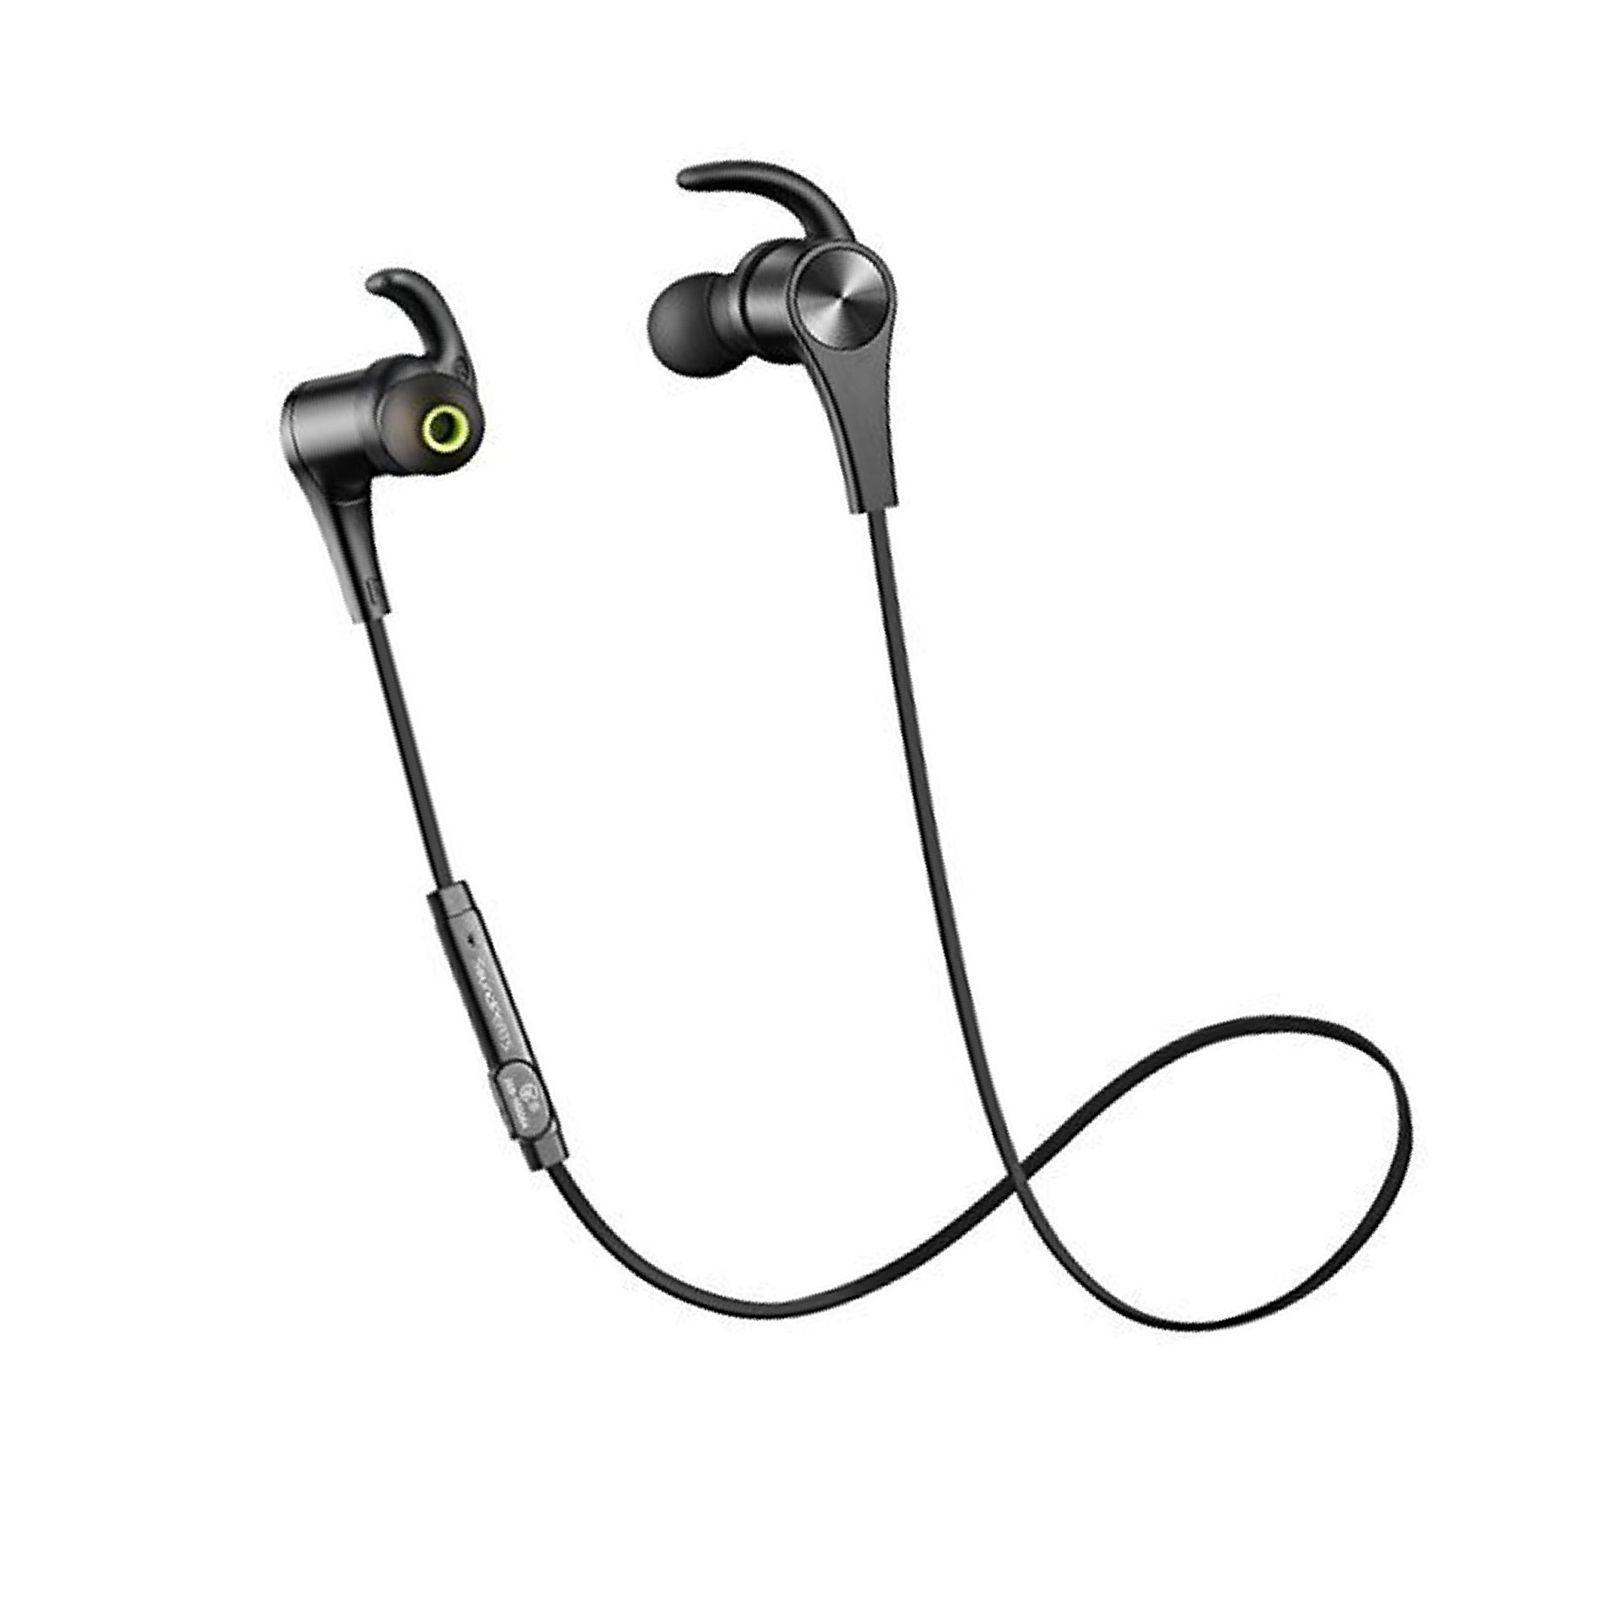 Soundpeats Bluetooth Headphones Wireless Earbuds Magnetic